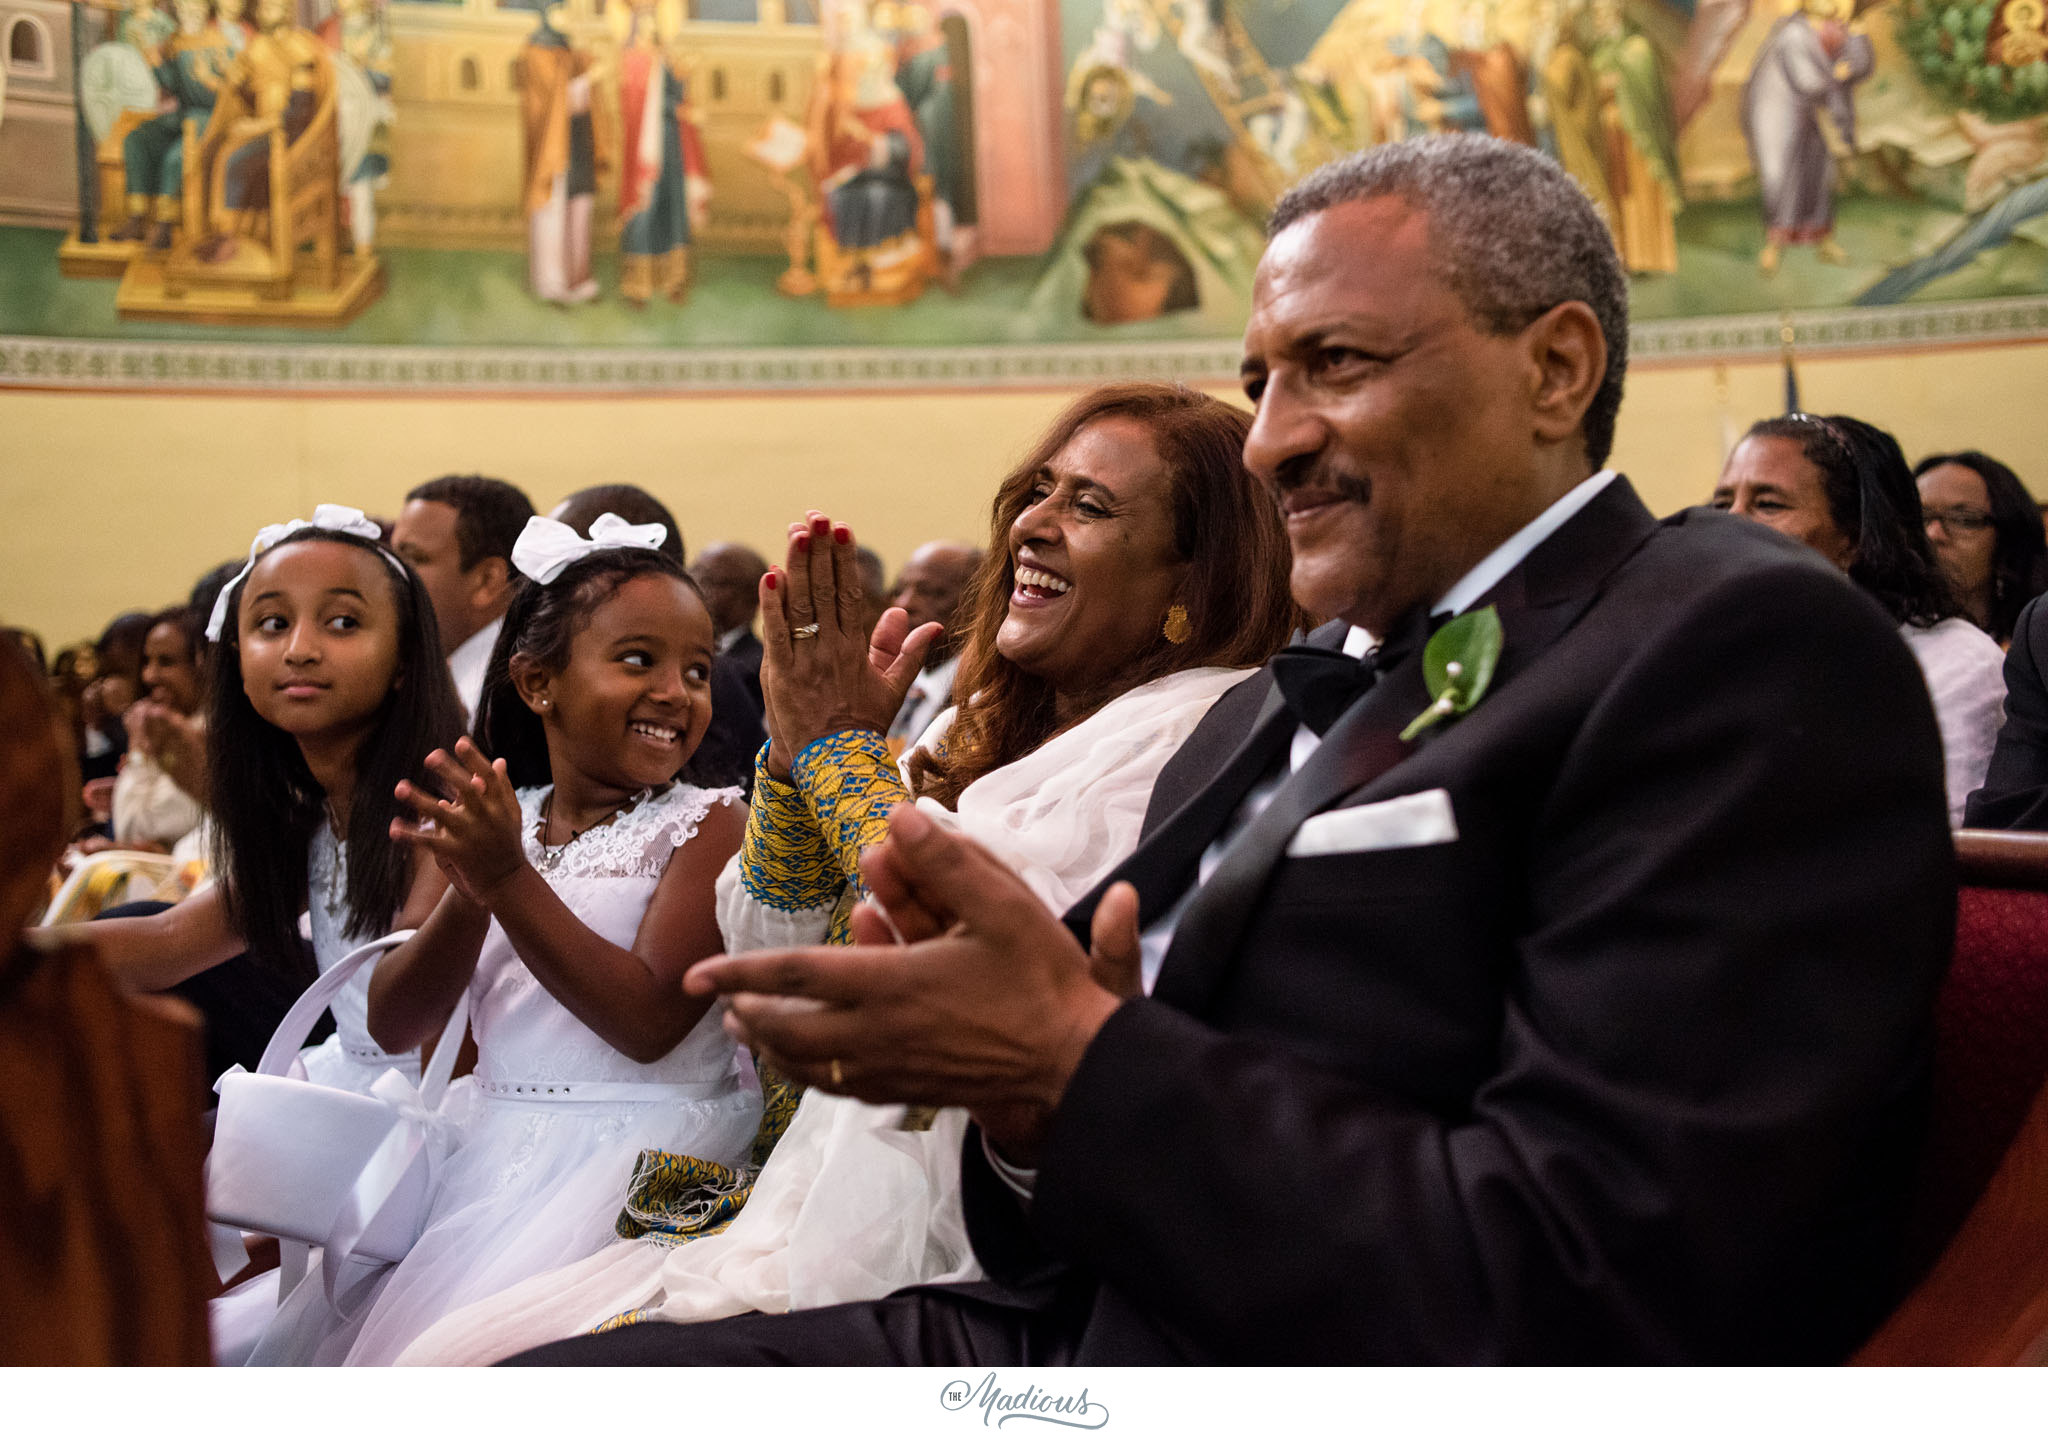 nmwa+wedding,+women+in+the+arts+wedding,+ethiopian+wedding,+dc+wedding+0082.jpg